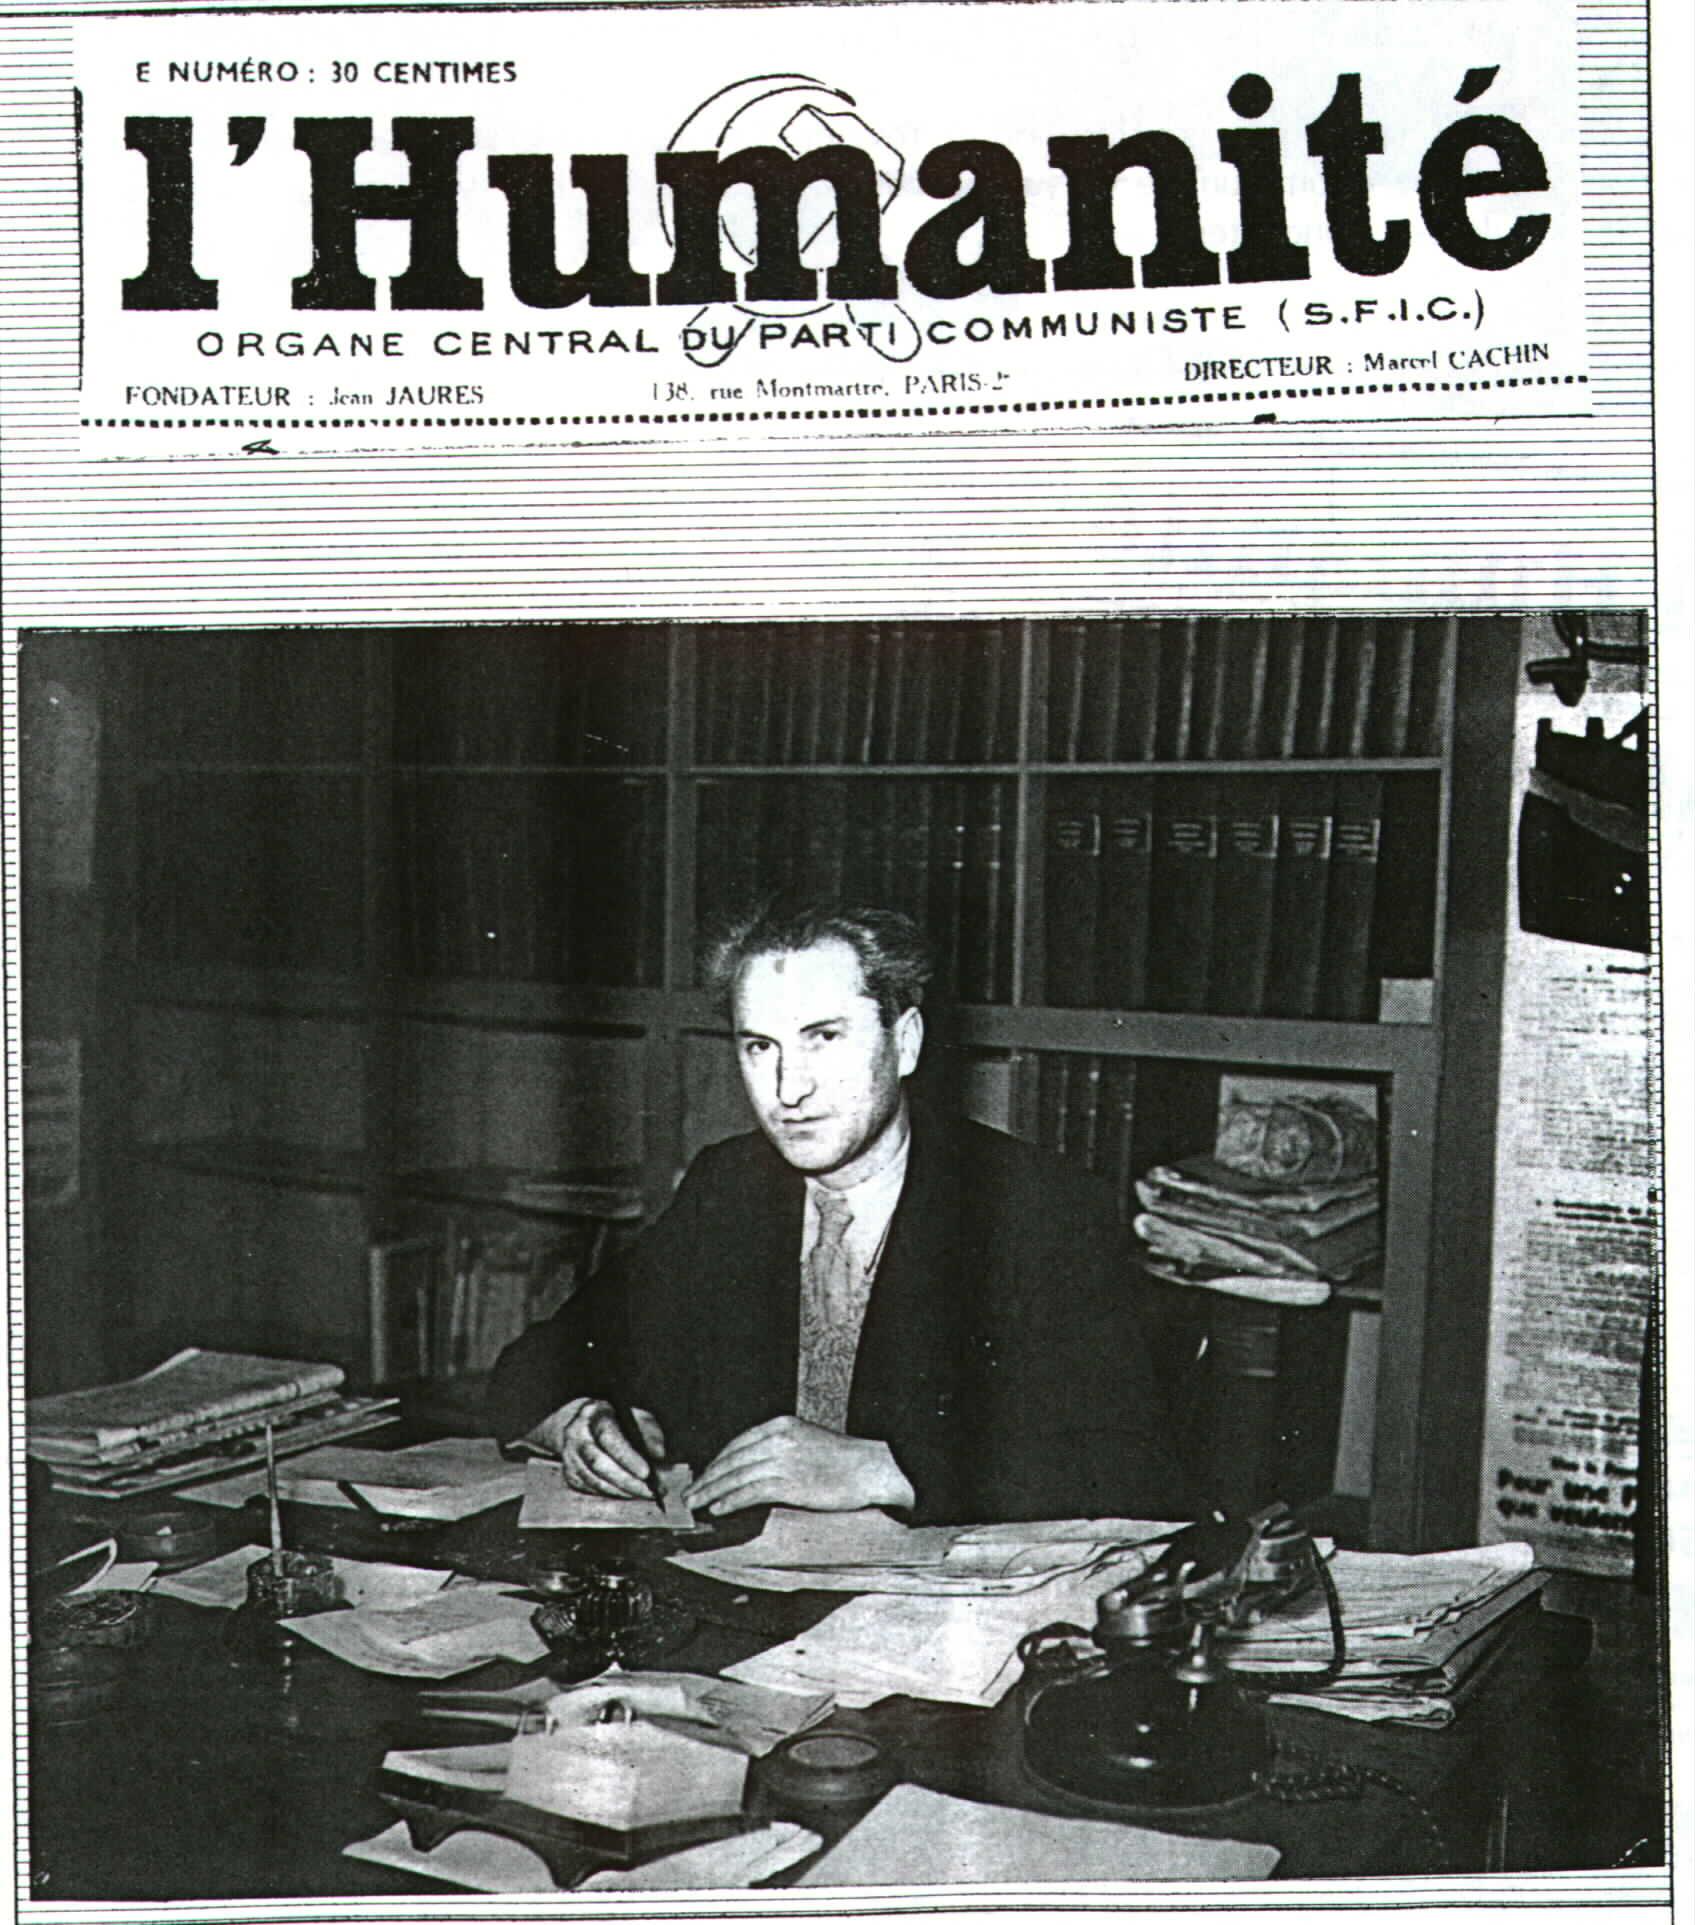 http://luciensampaix.free.fr/humanite.jpg